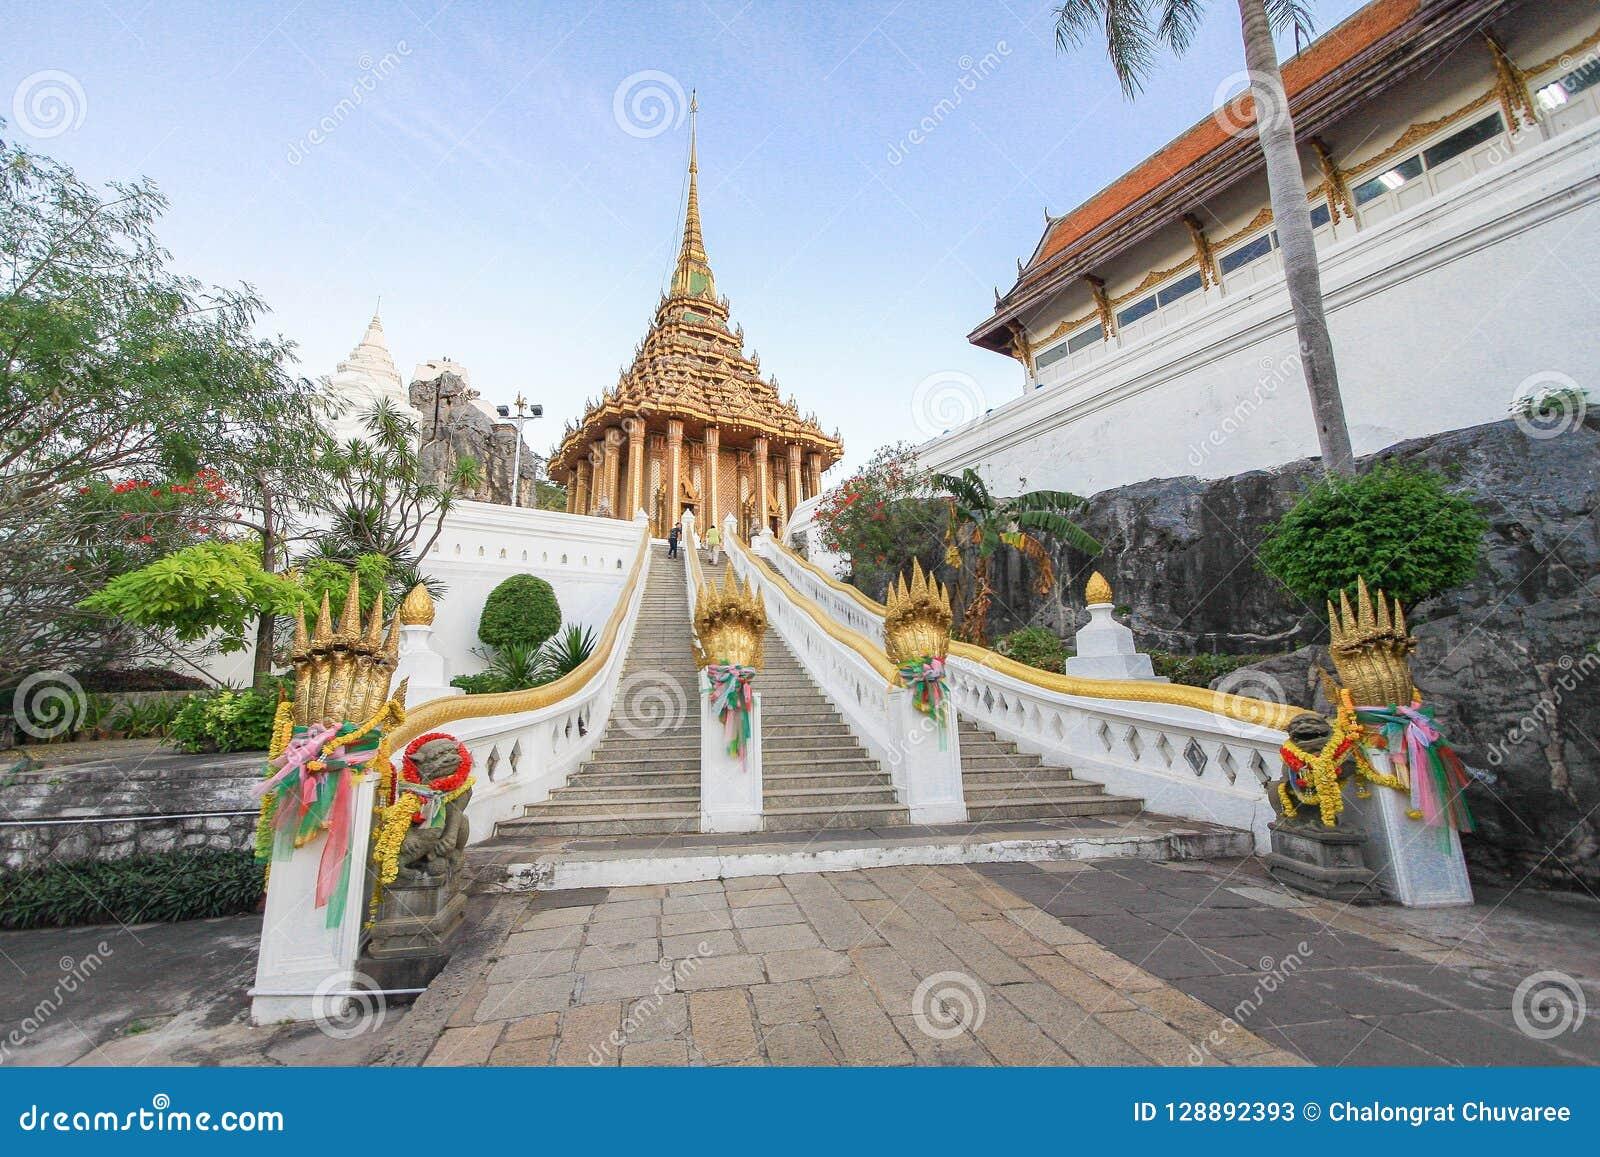 Escaliers Wat Phra Phutthabat, Saraburi Thaïlande